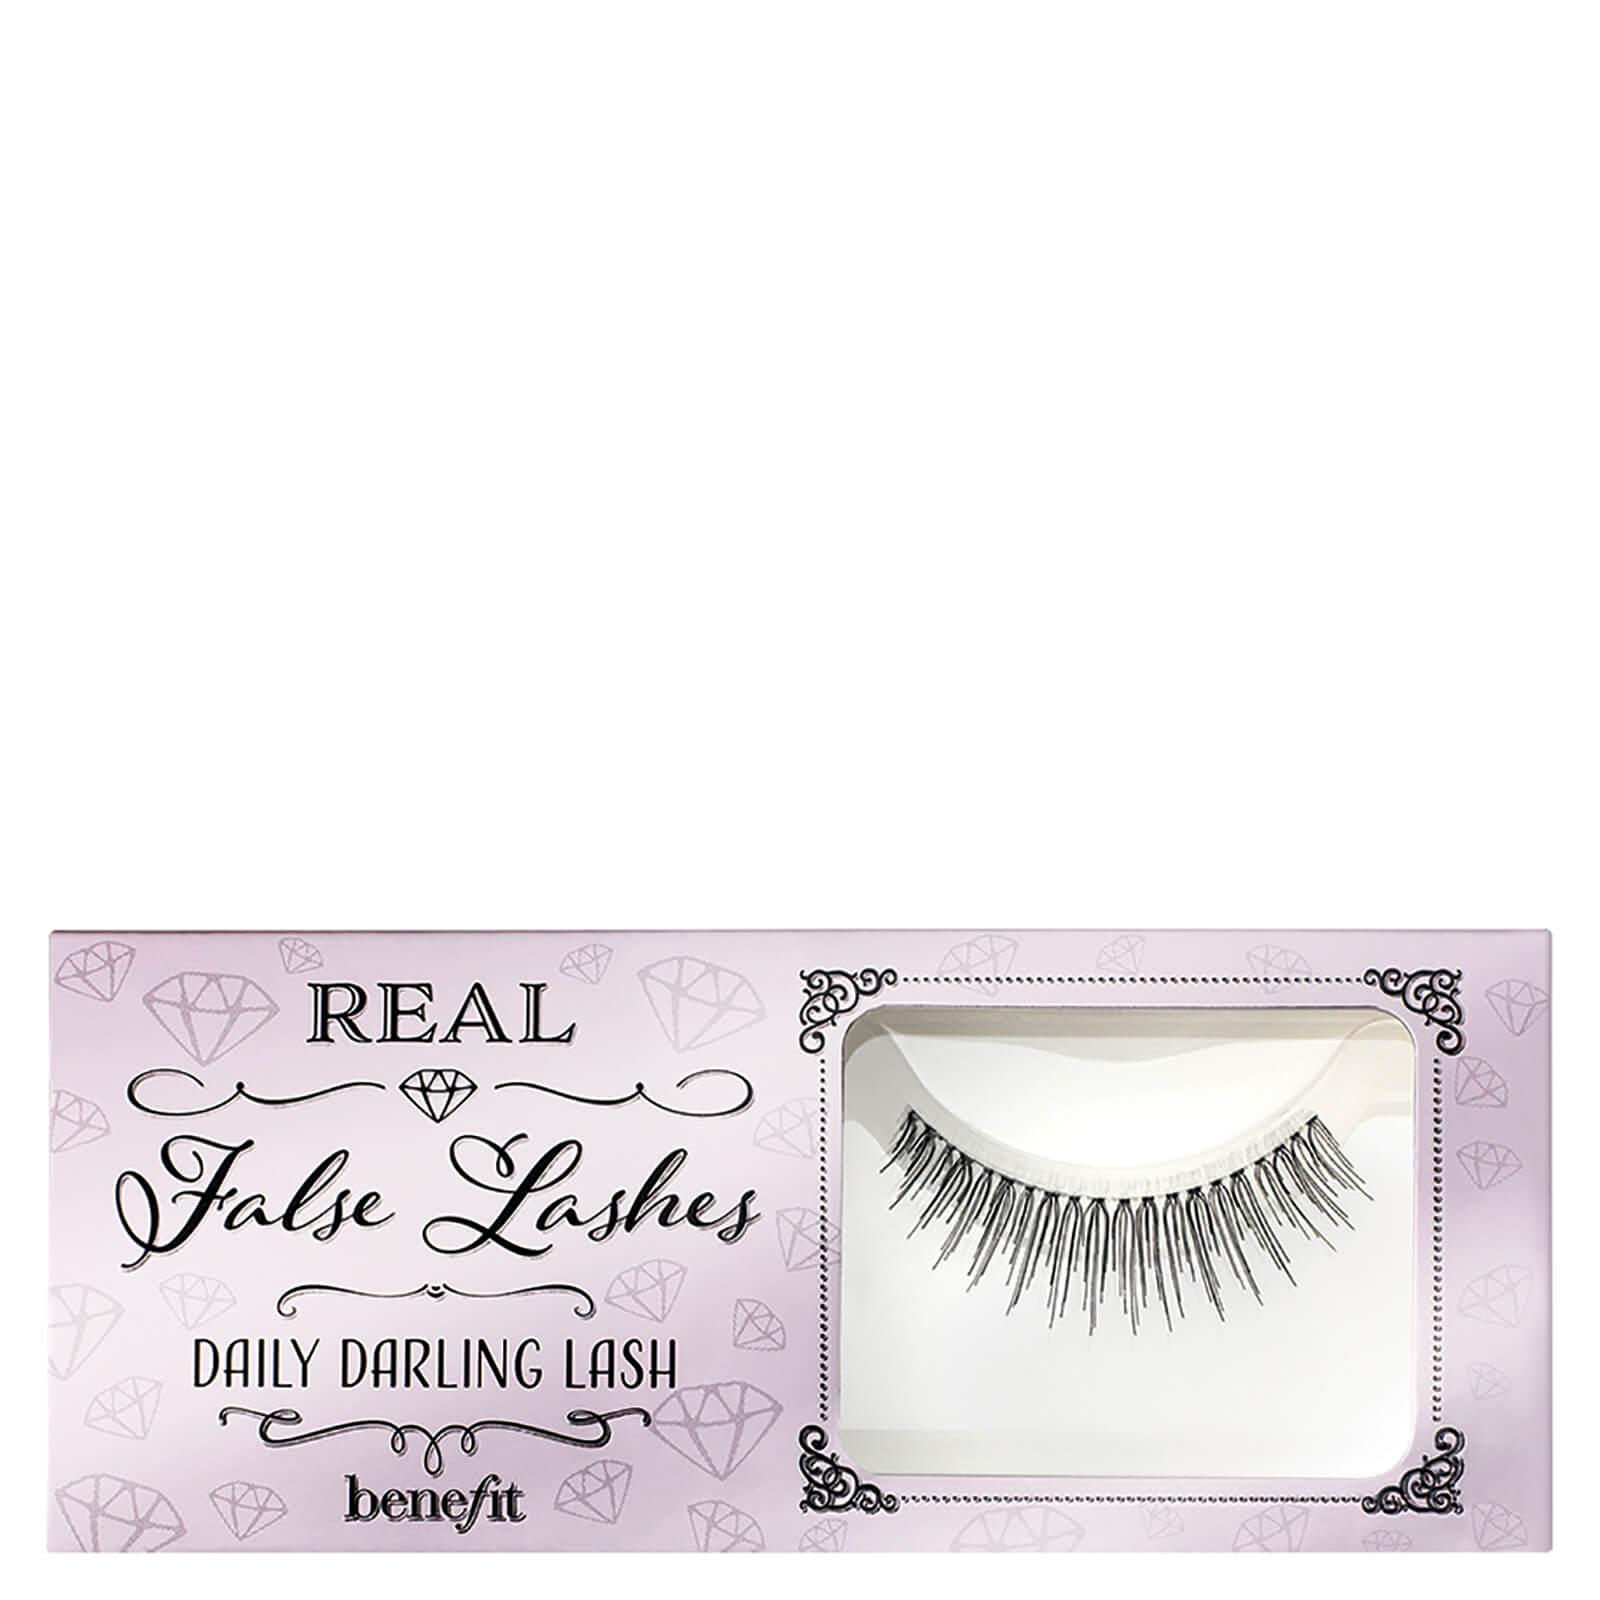 df9c9a2e764 benefit Real False Lashes - Daily Darling | Free Shipping | Lookfantastic